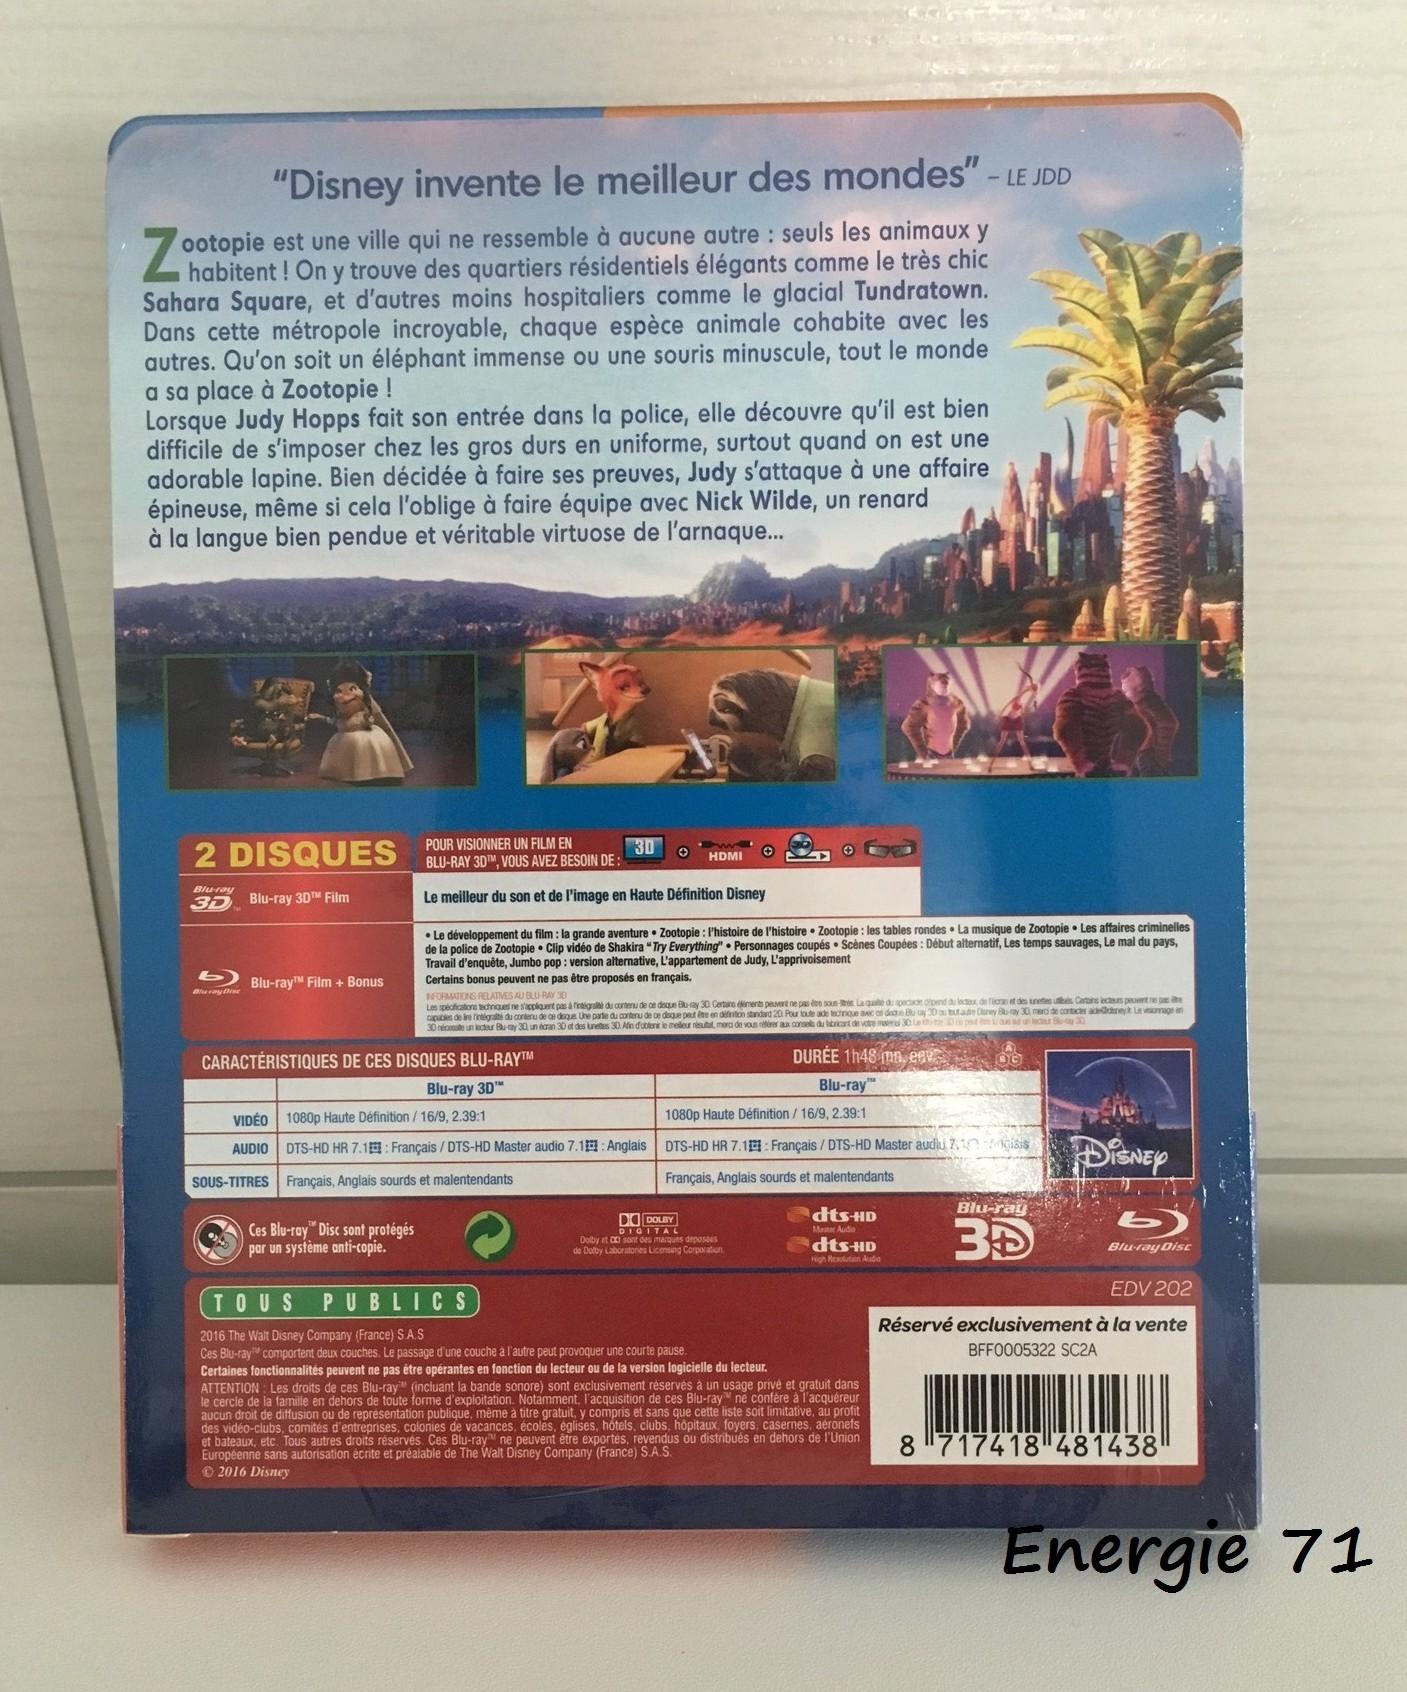 [BD + 3D + DVD] Zootopie (29 Juin 2016)  - Page 5 160628055130781140